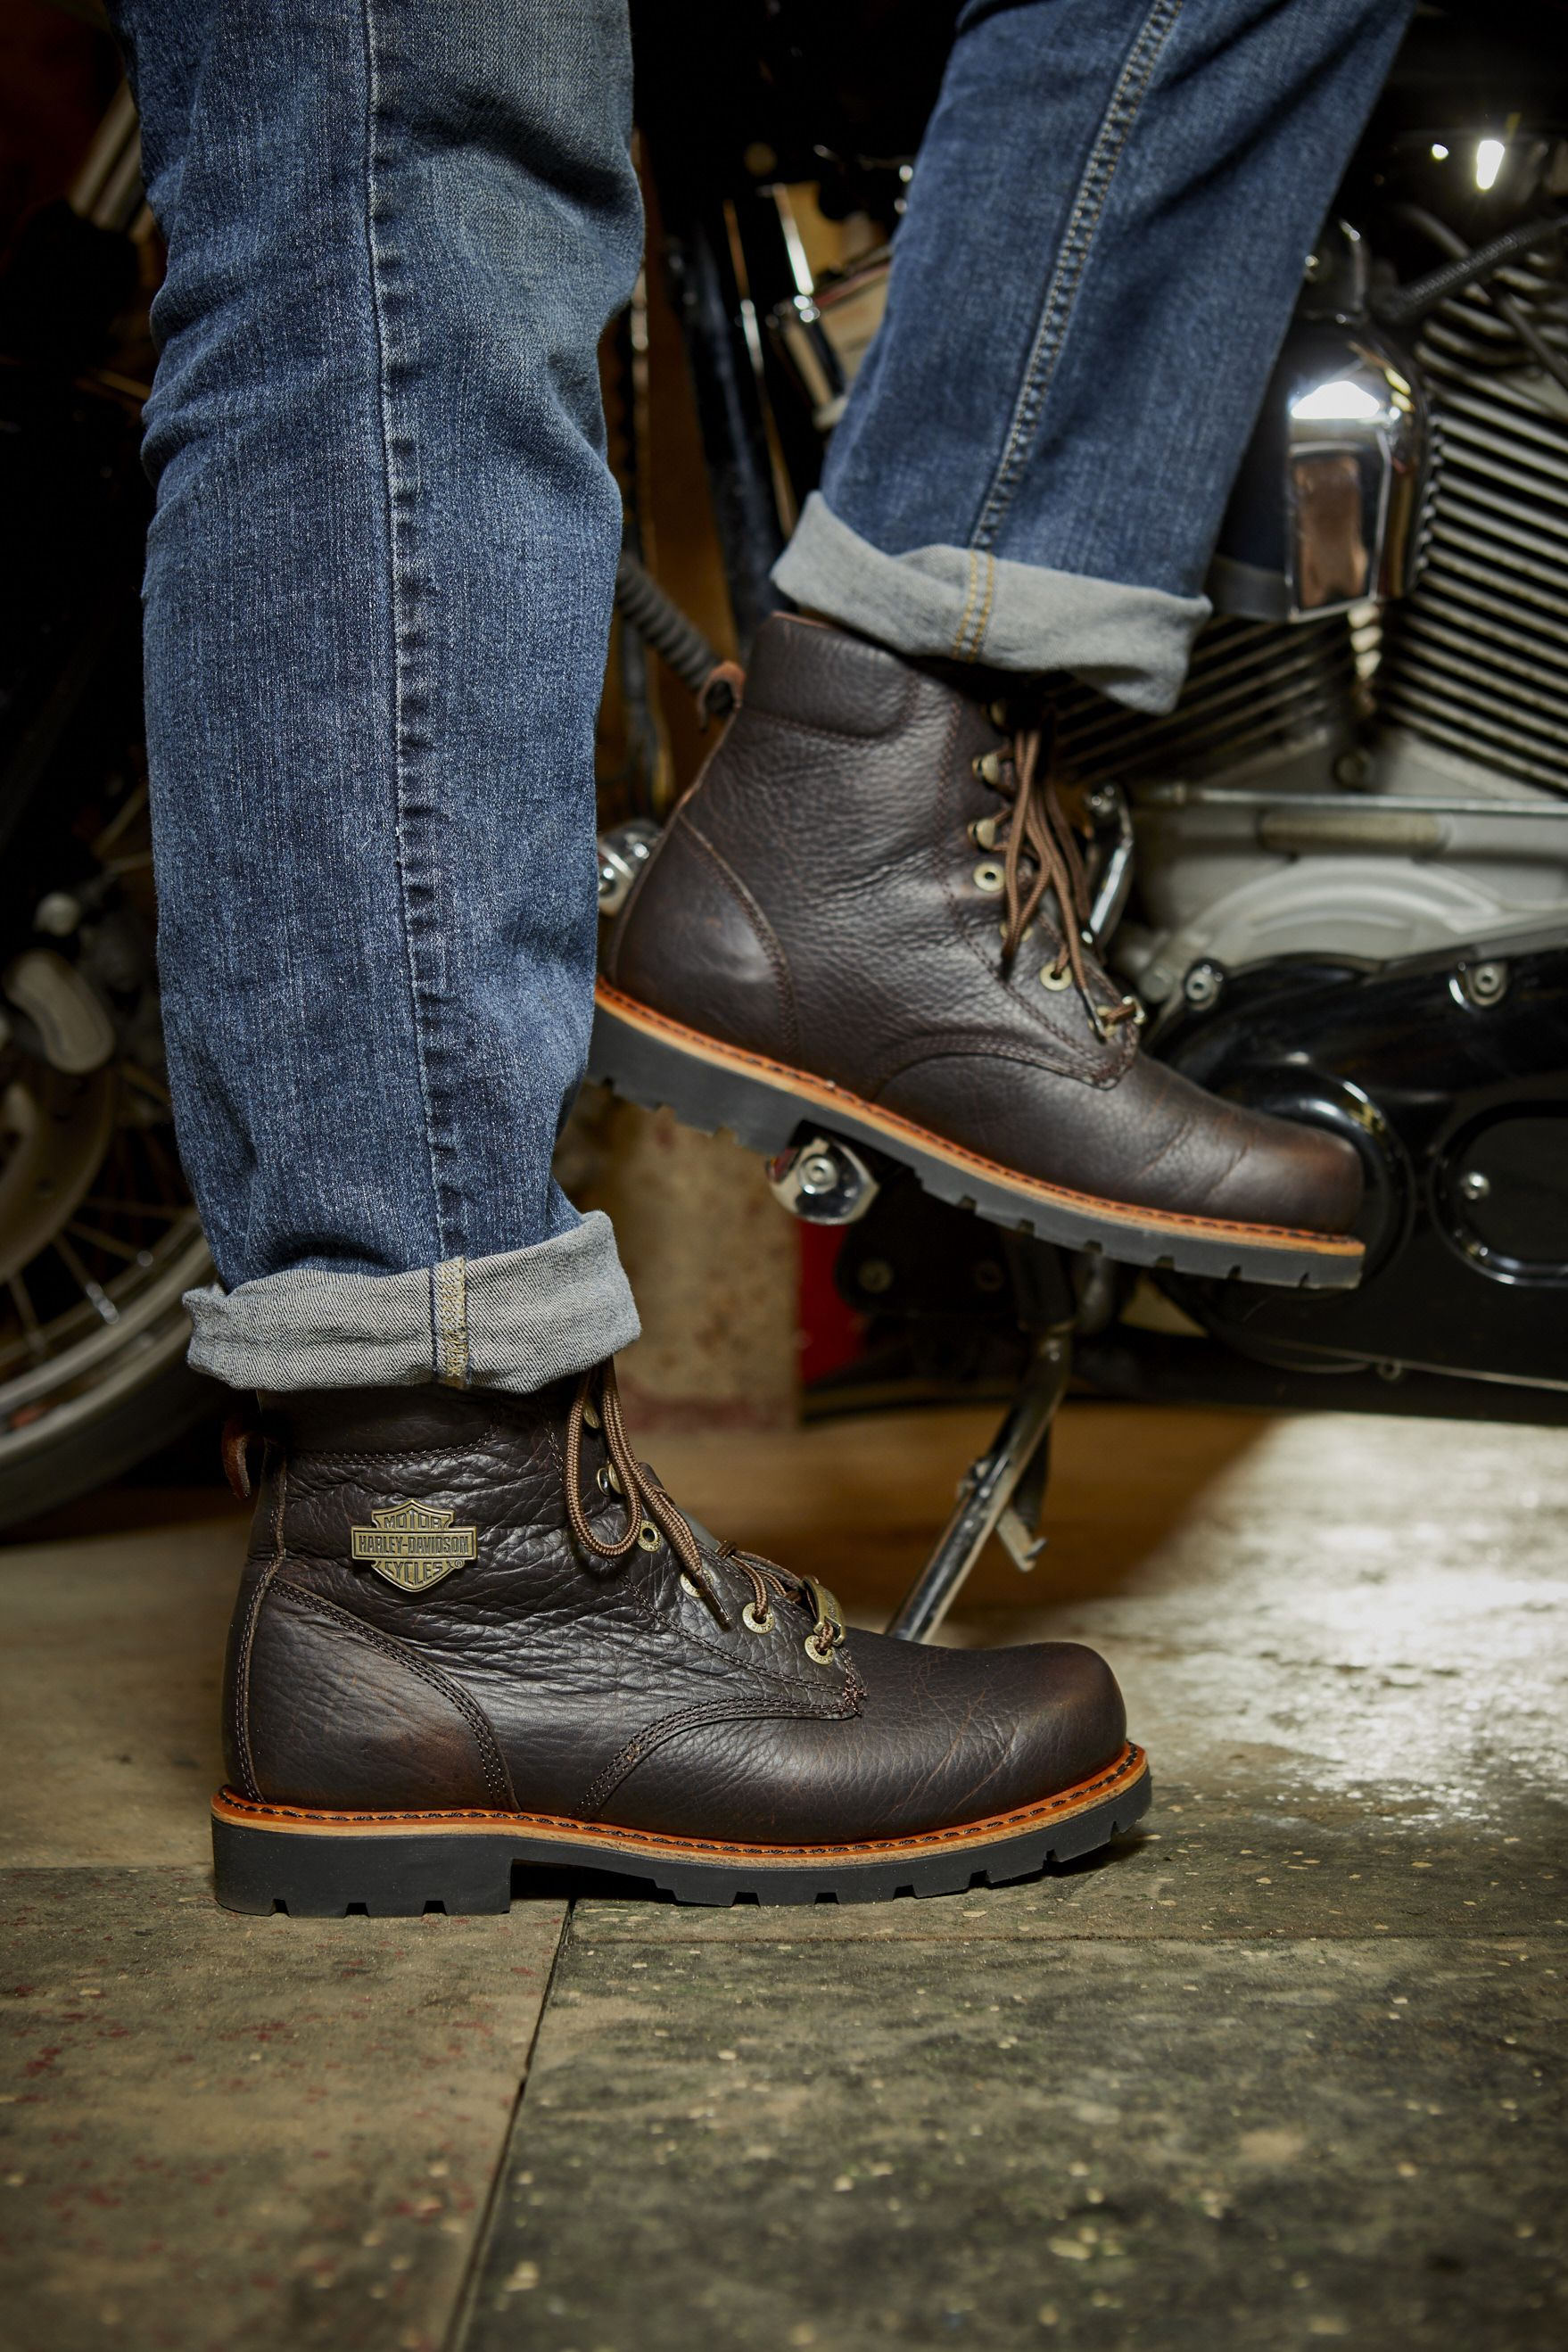 Boot Motorcycle Boots 2019Mens Ridge In Men's Vista vn0m8wN